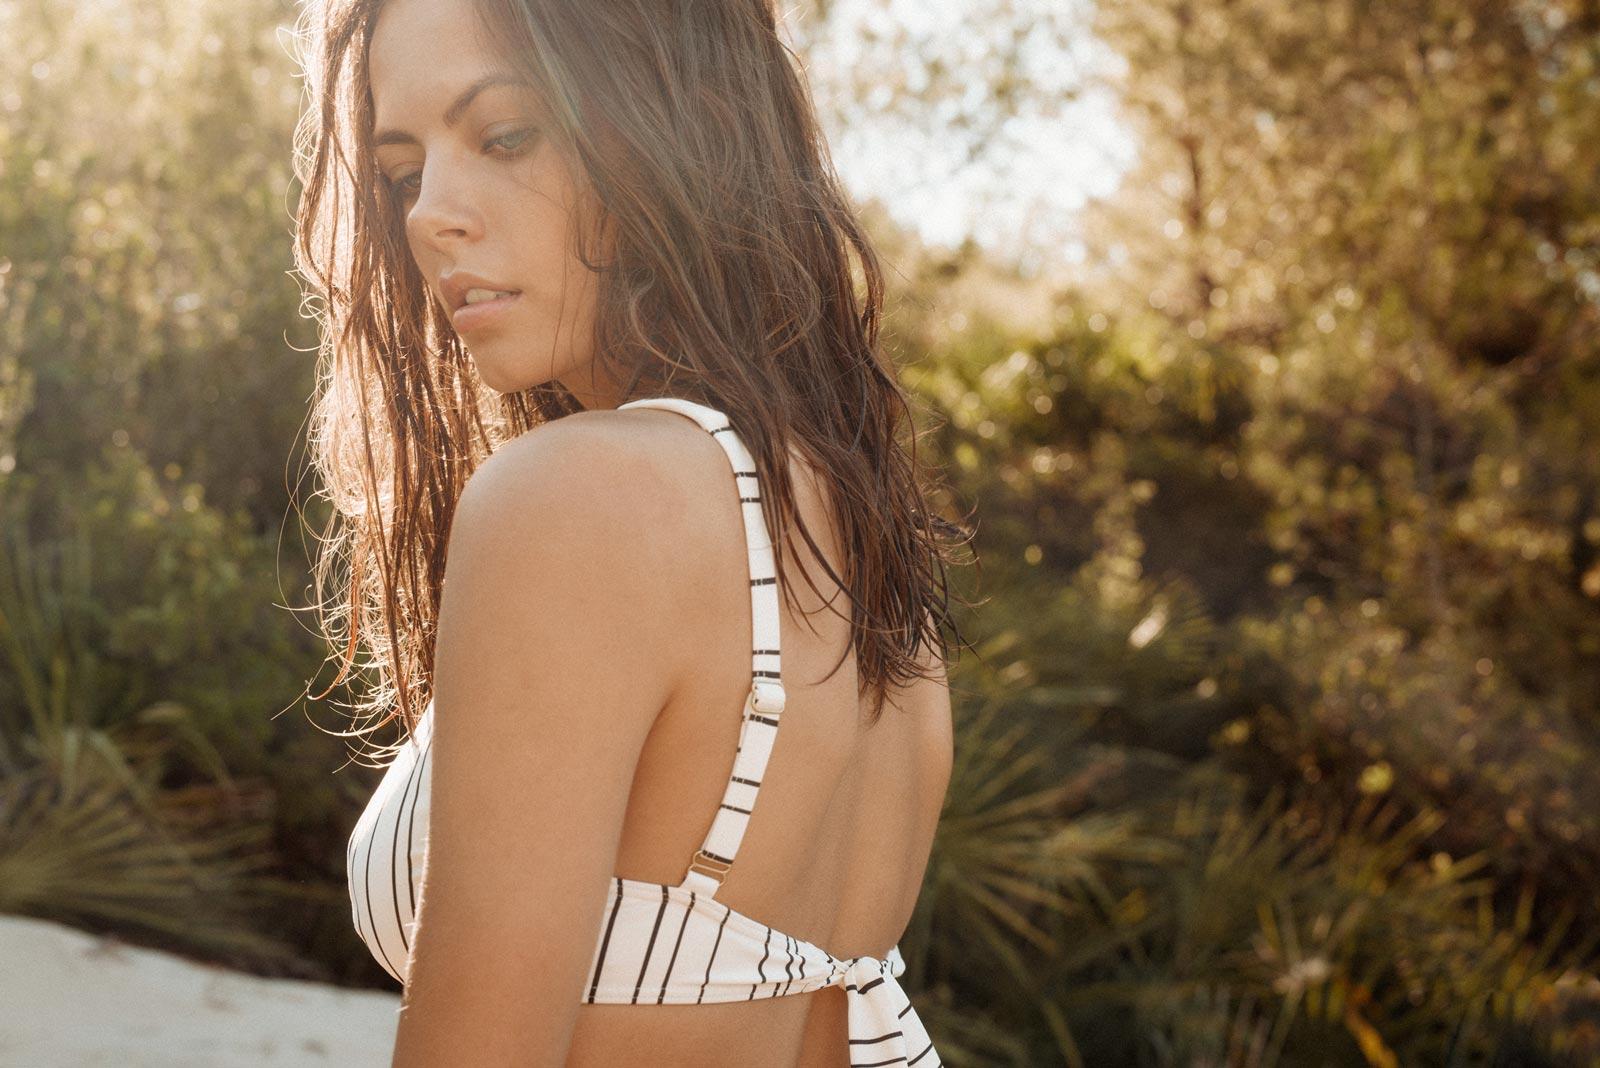 Kigo bikini top Limitless by RESET PRIORITY